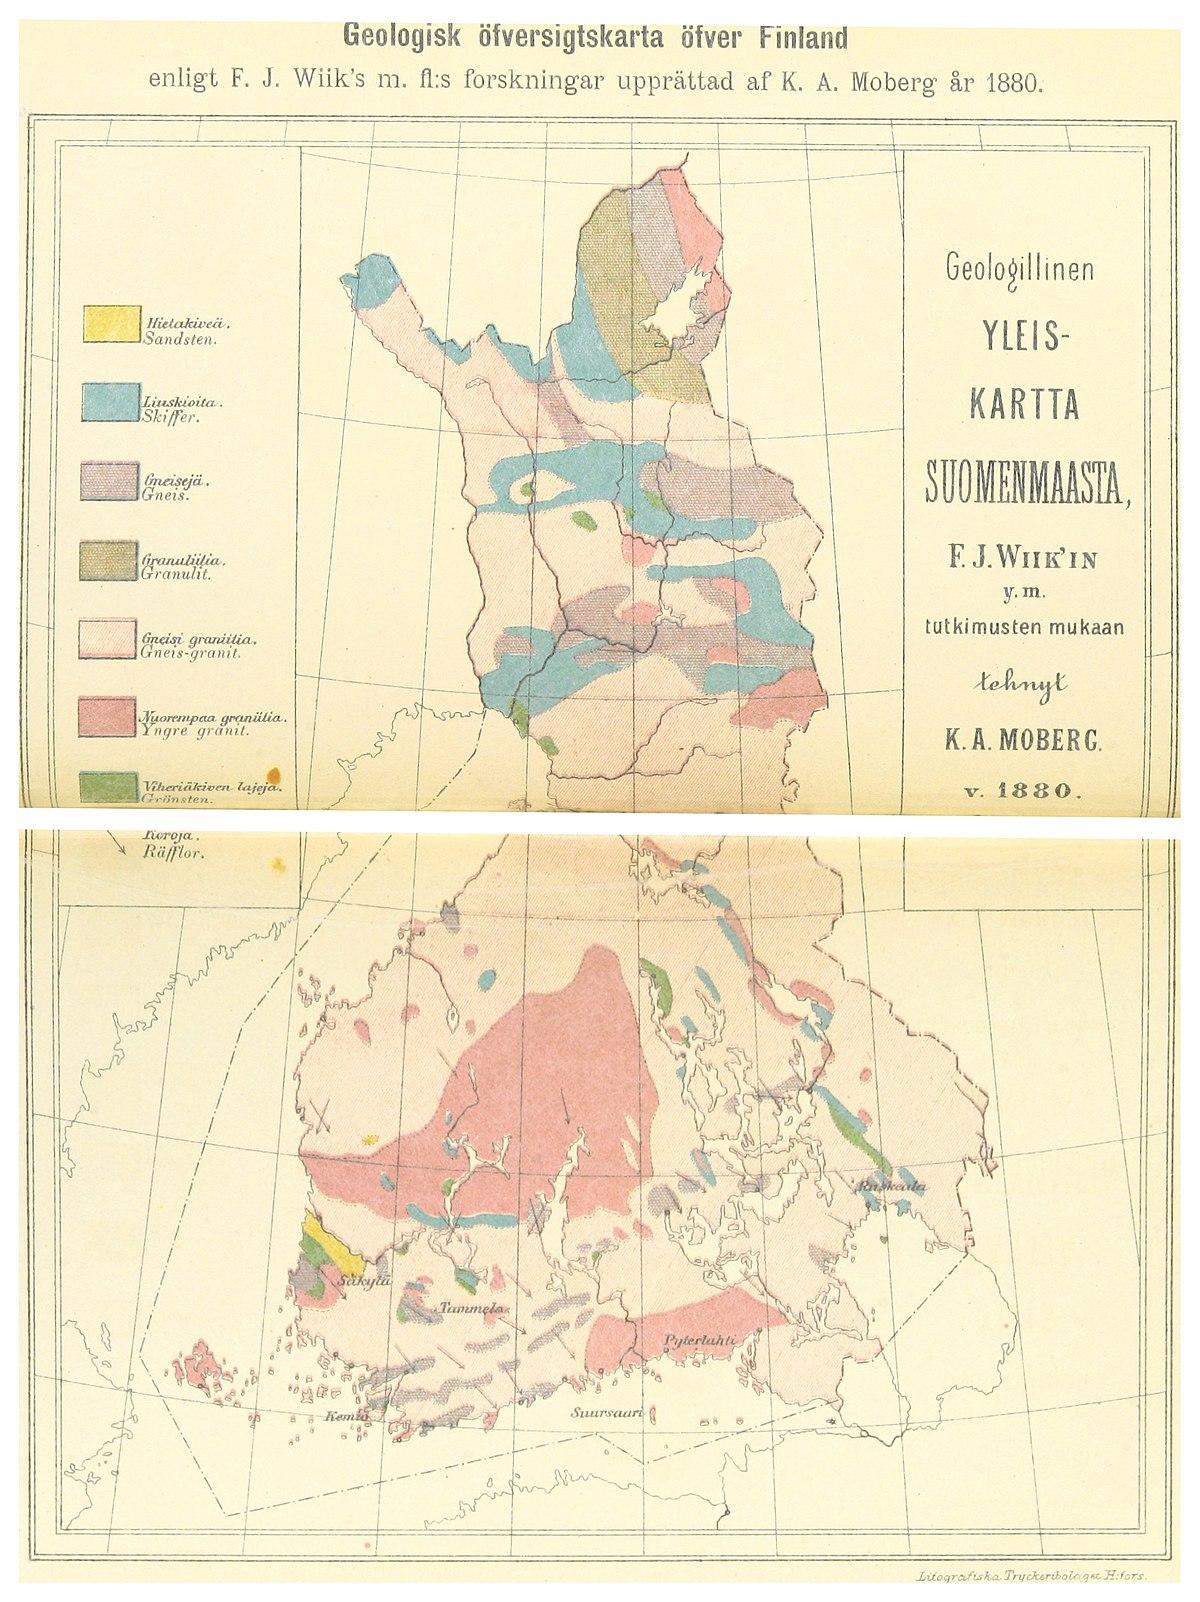 File Ignatius 1891 P186 Geologisk Ofversigtskarta Ofver Finland